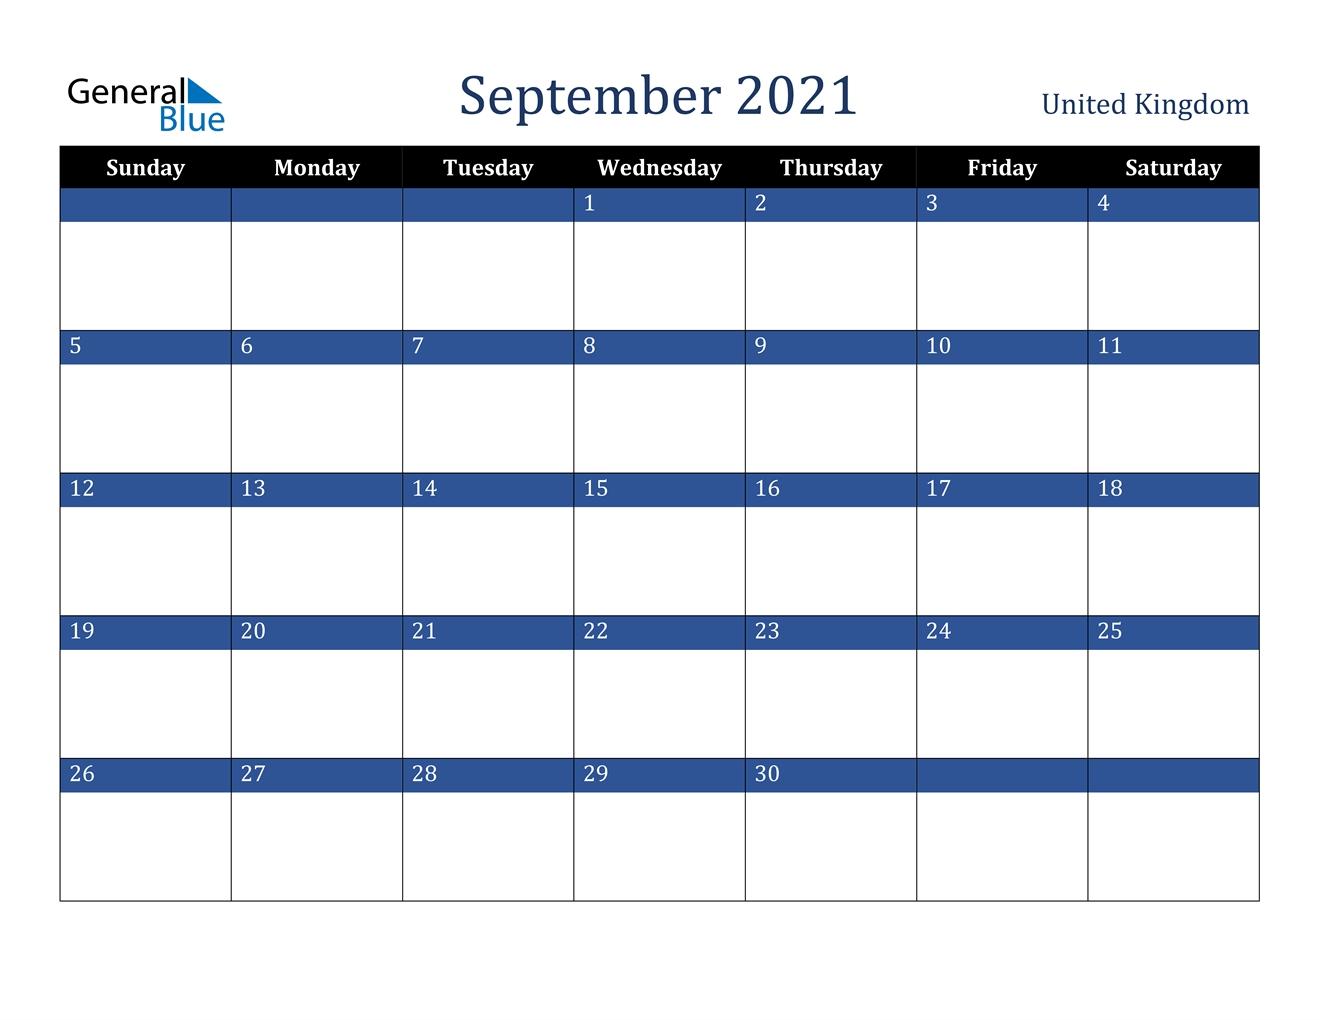 September 2021 Calendar - United Kingdom September 2021 Calendar With Holidays Printable